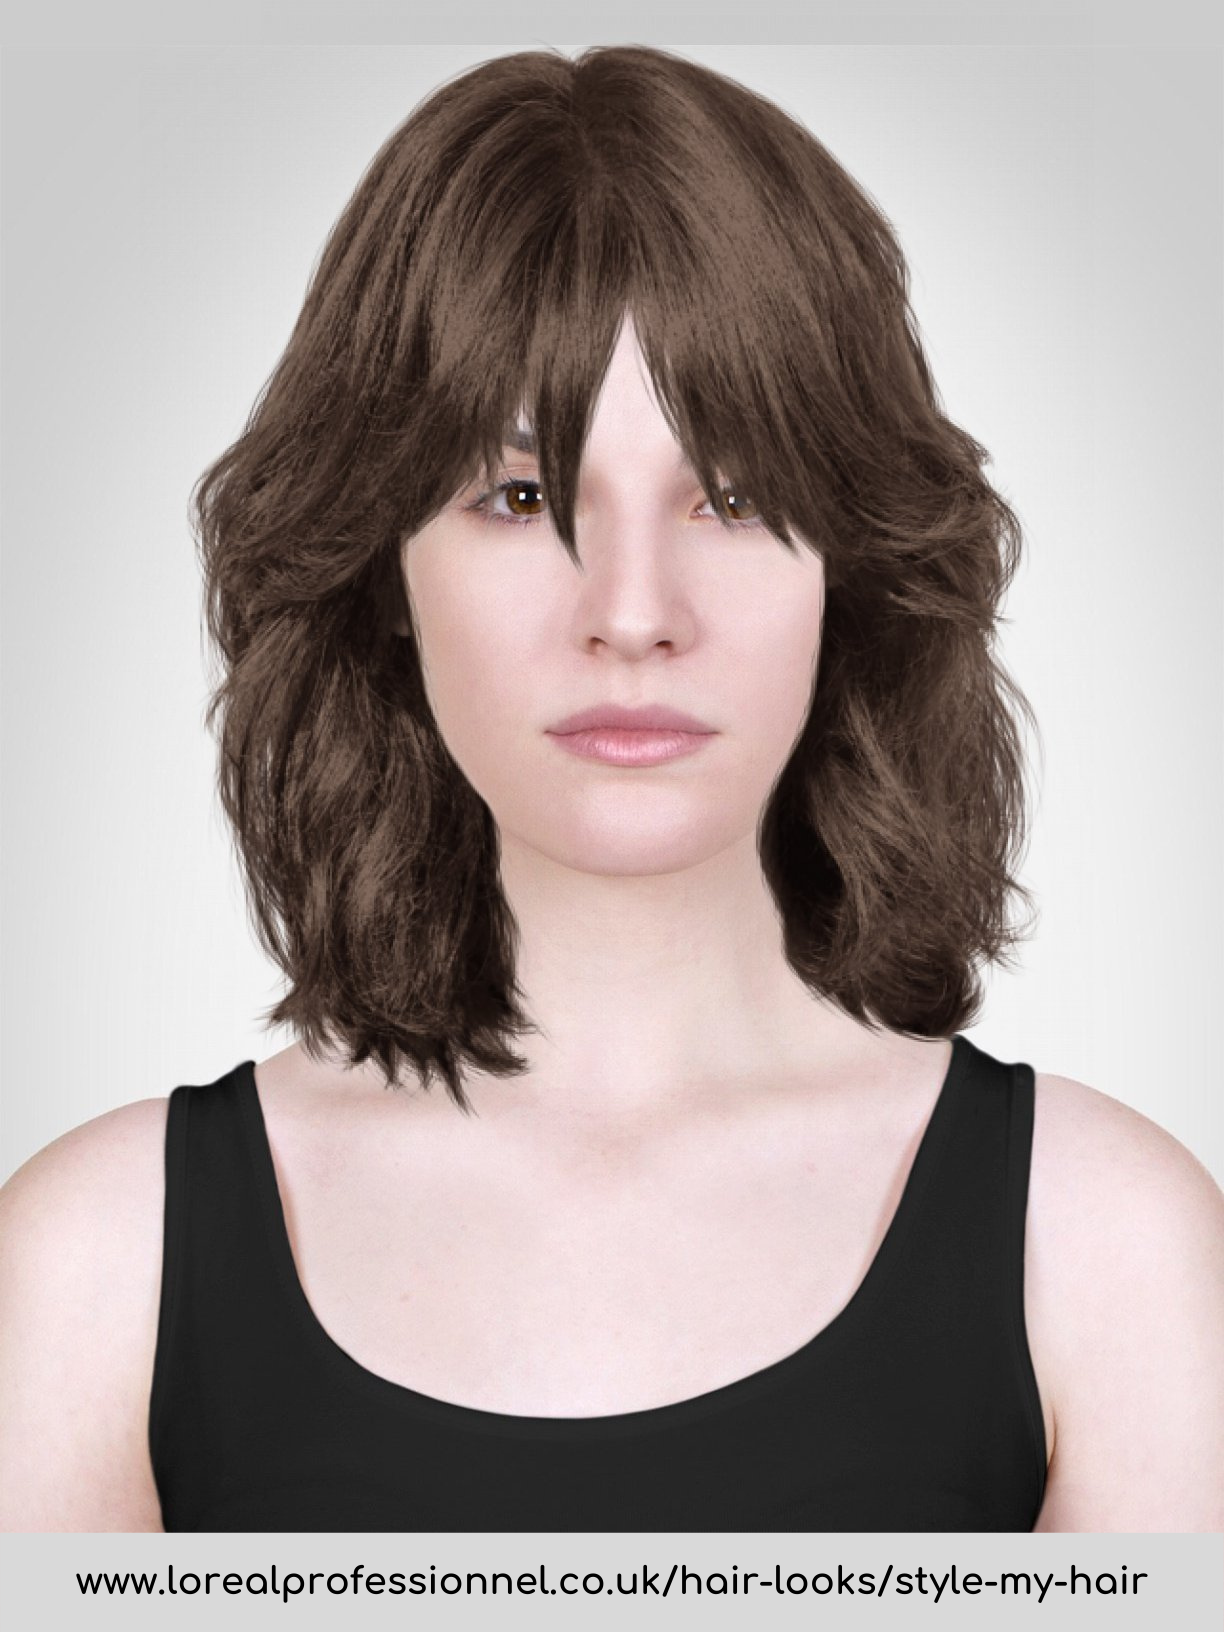 Szögletes archoz frizura